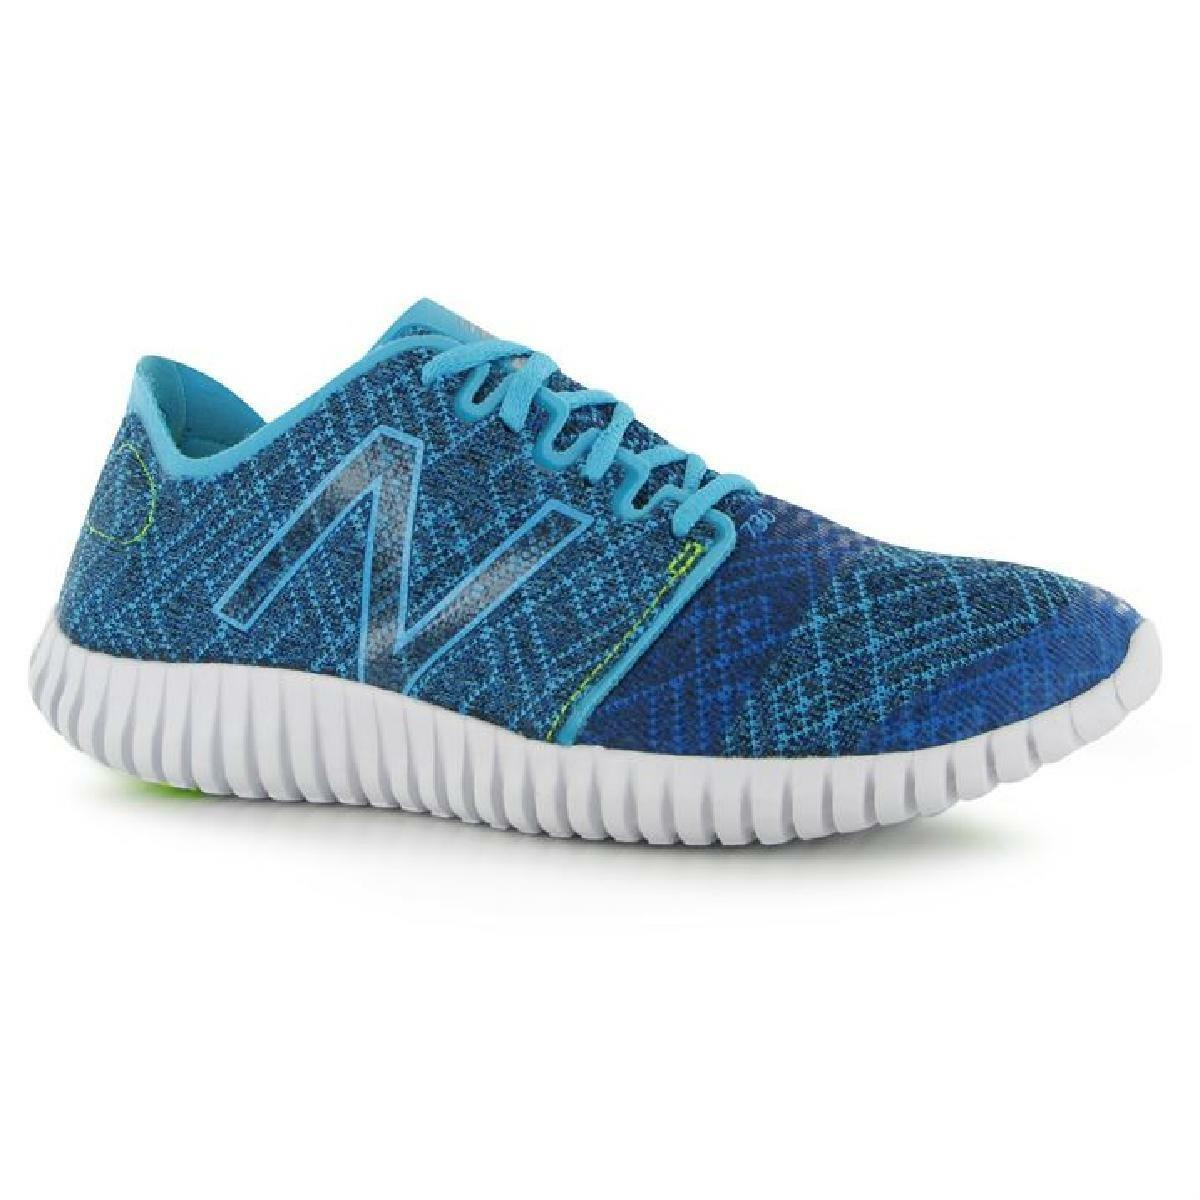 size 40 048f1 c8ee4 New Balance Zapatillas 38 Mujer deportivas trainers Jogging 85 51f88d -  inhal.es